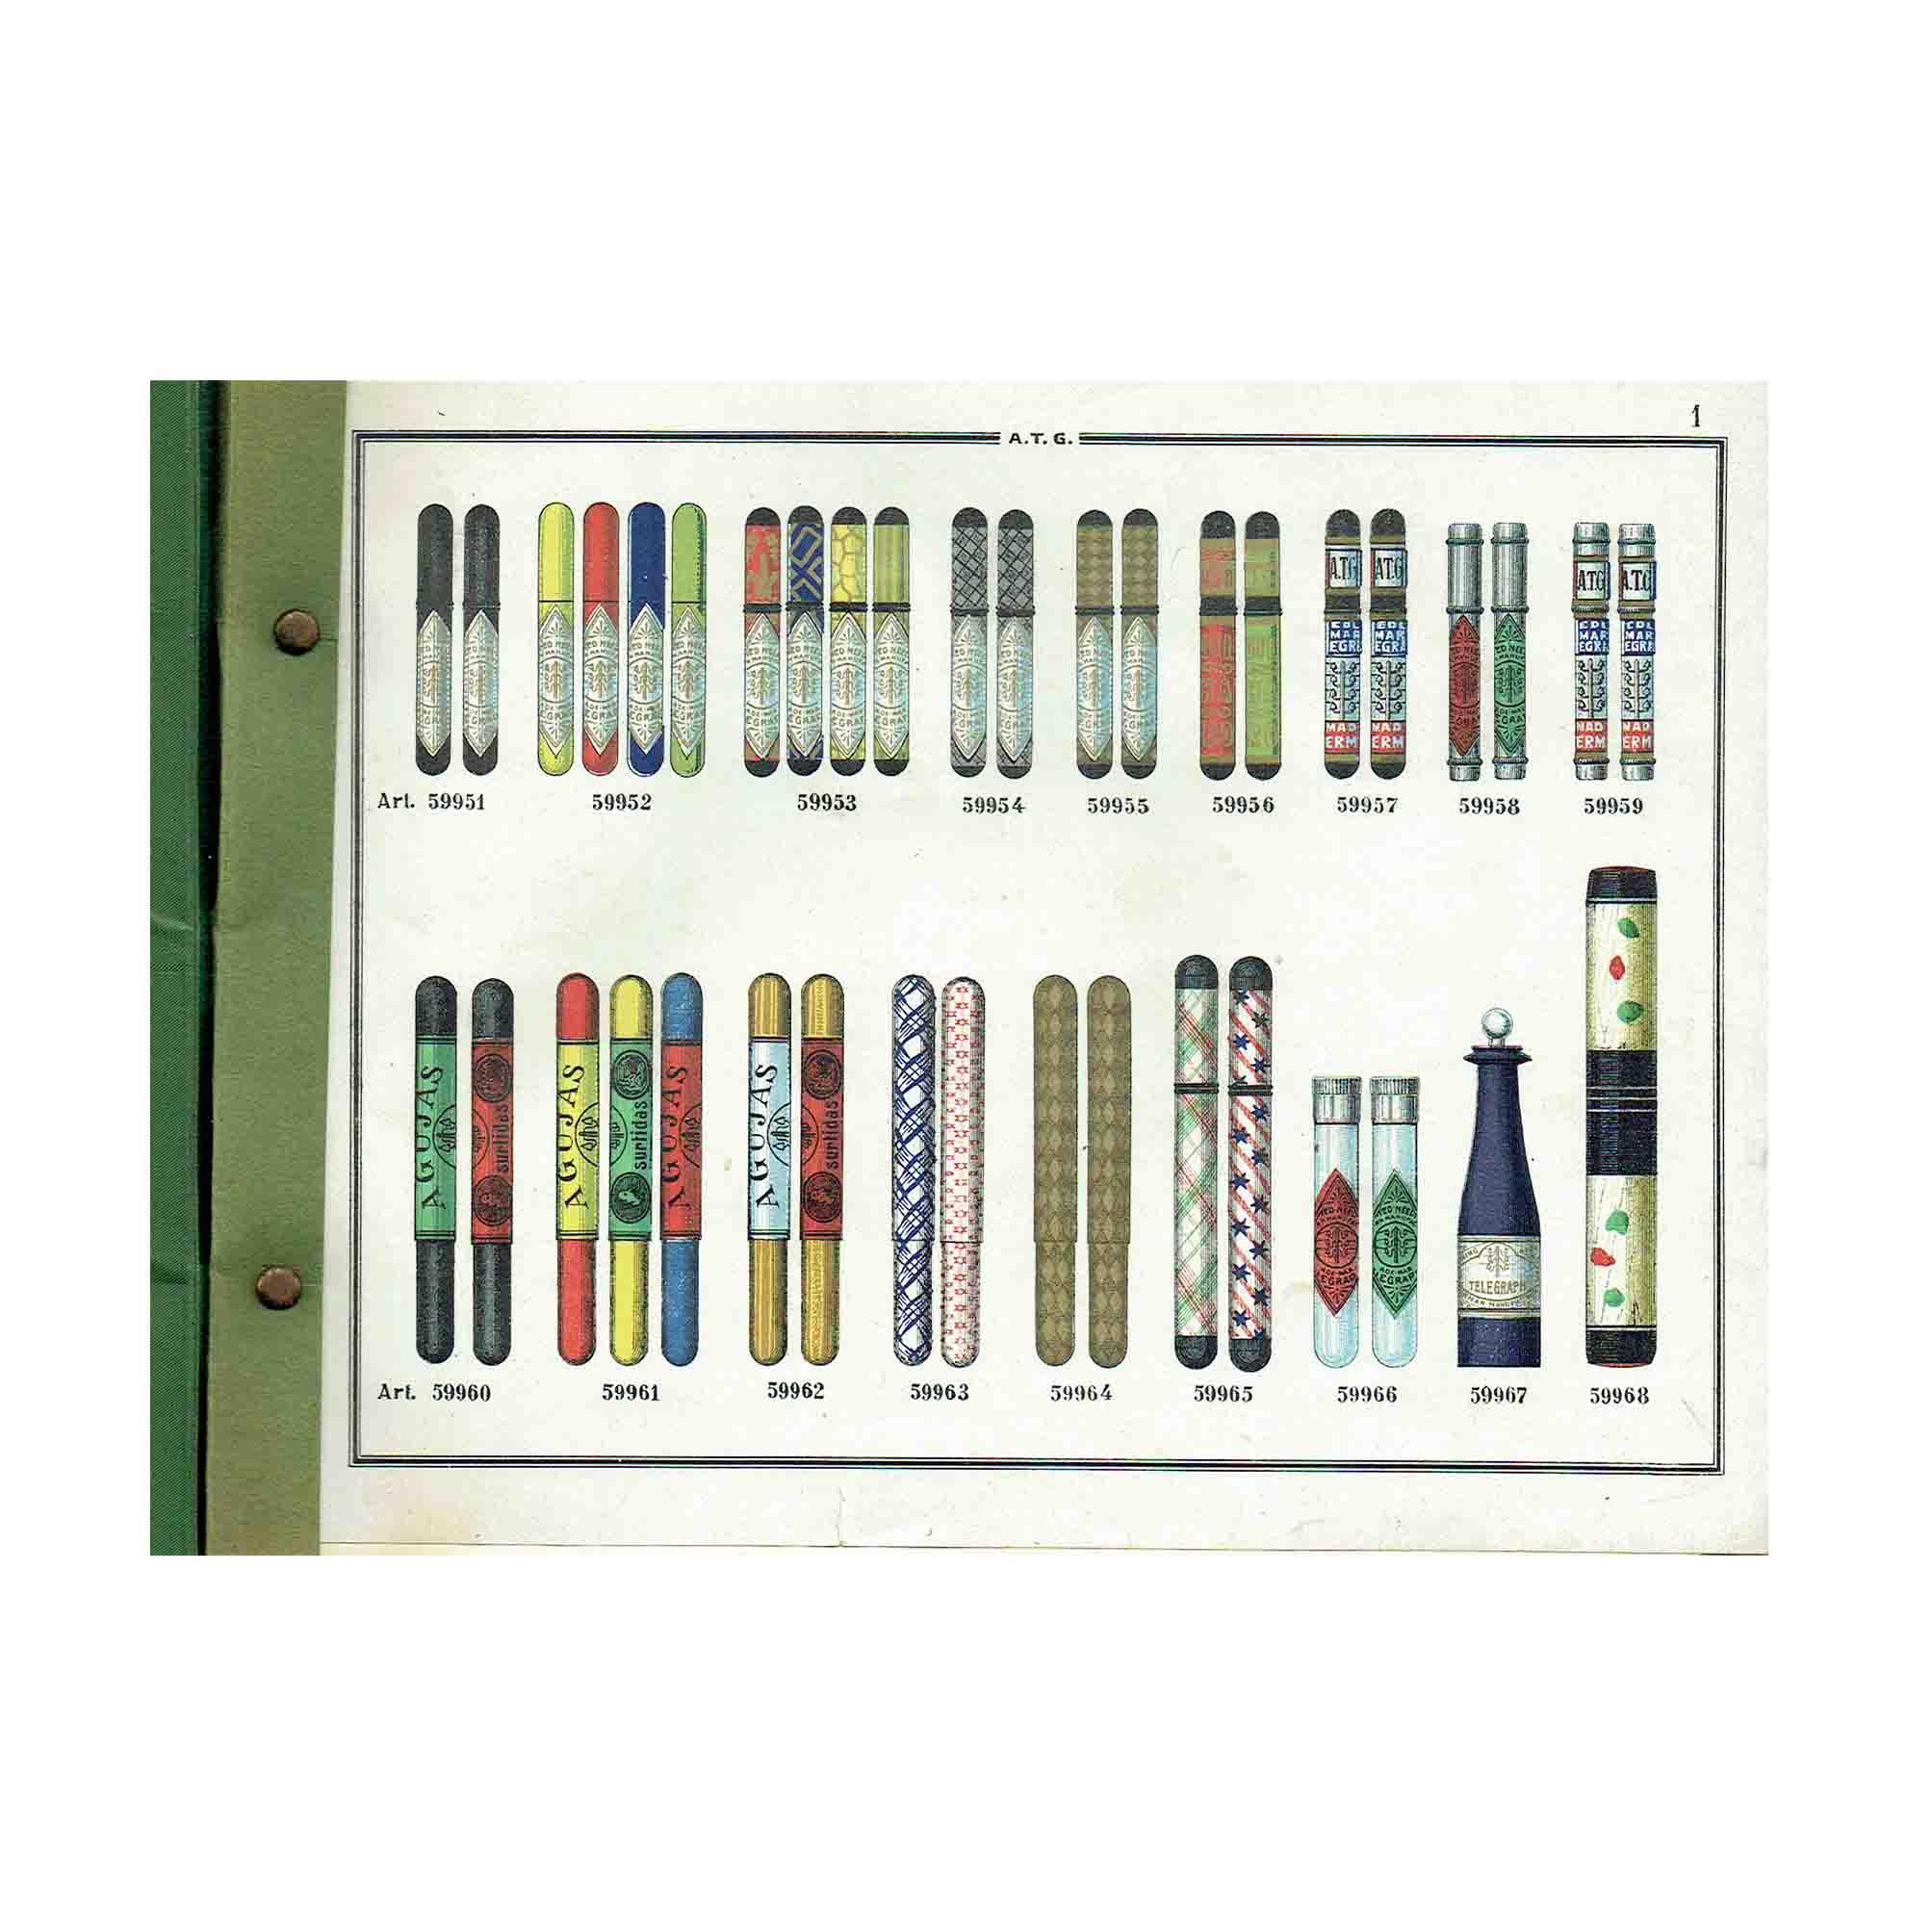 6008 ATG Catalogue Needles Pins Fish-Hooks 1900 Needle Boxes N